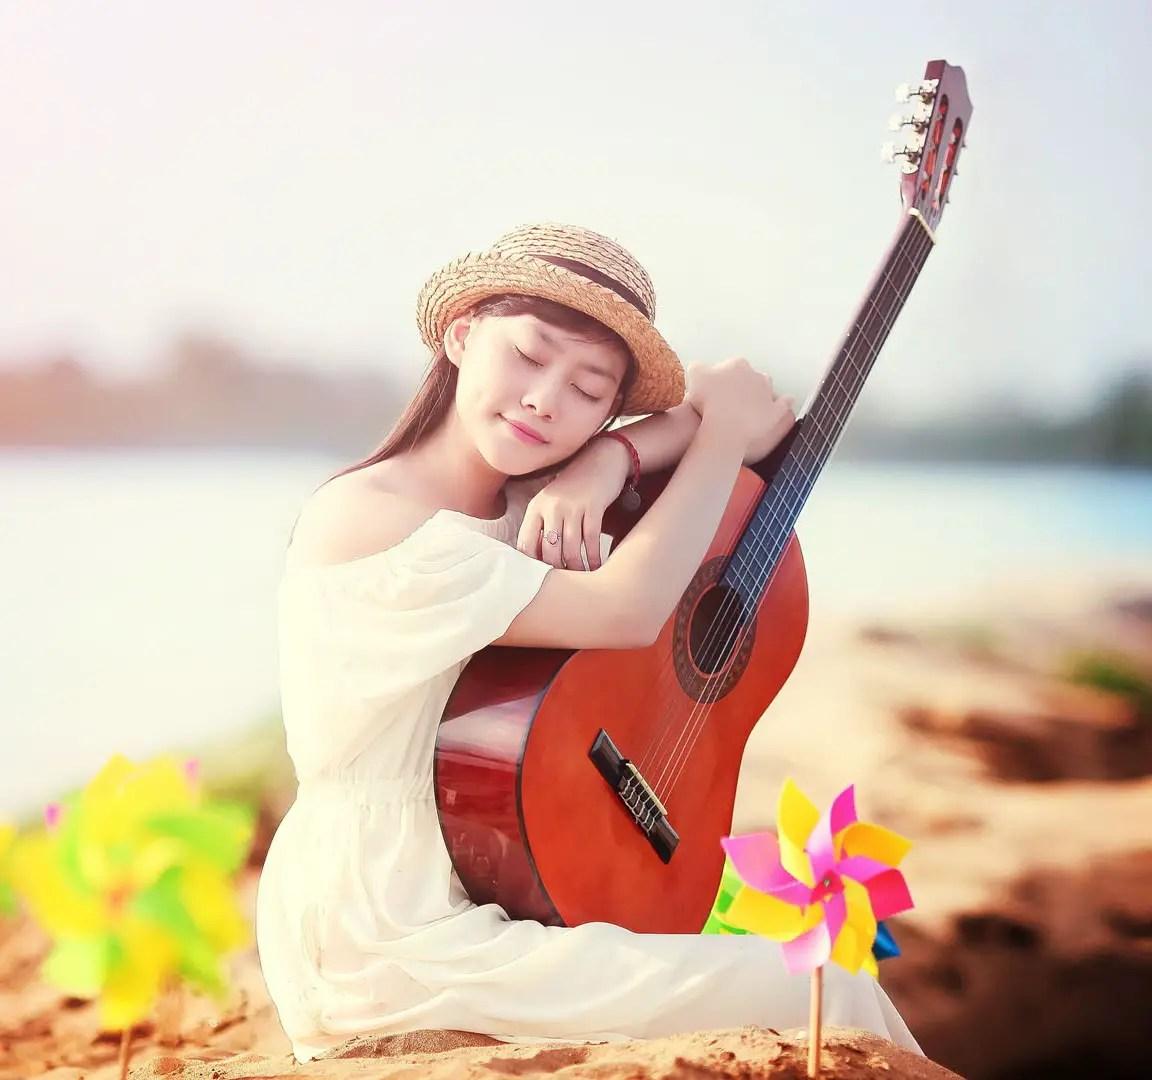 Guitar Whatsapp Wallpaper: Cute And Innocent Girls DP For Whatsapp And Facebook